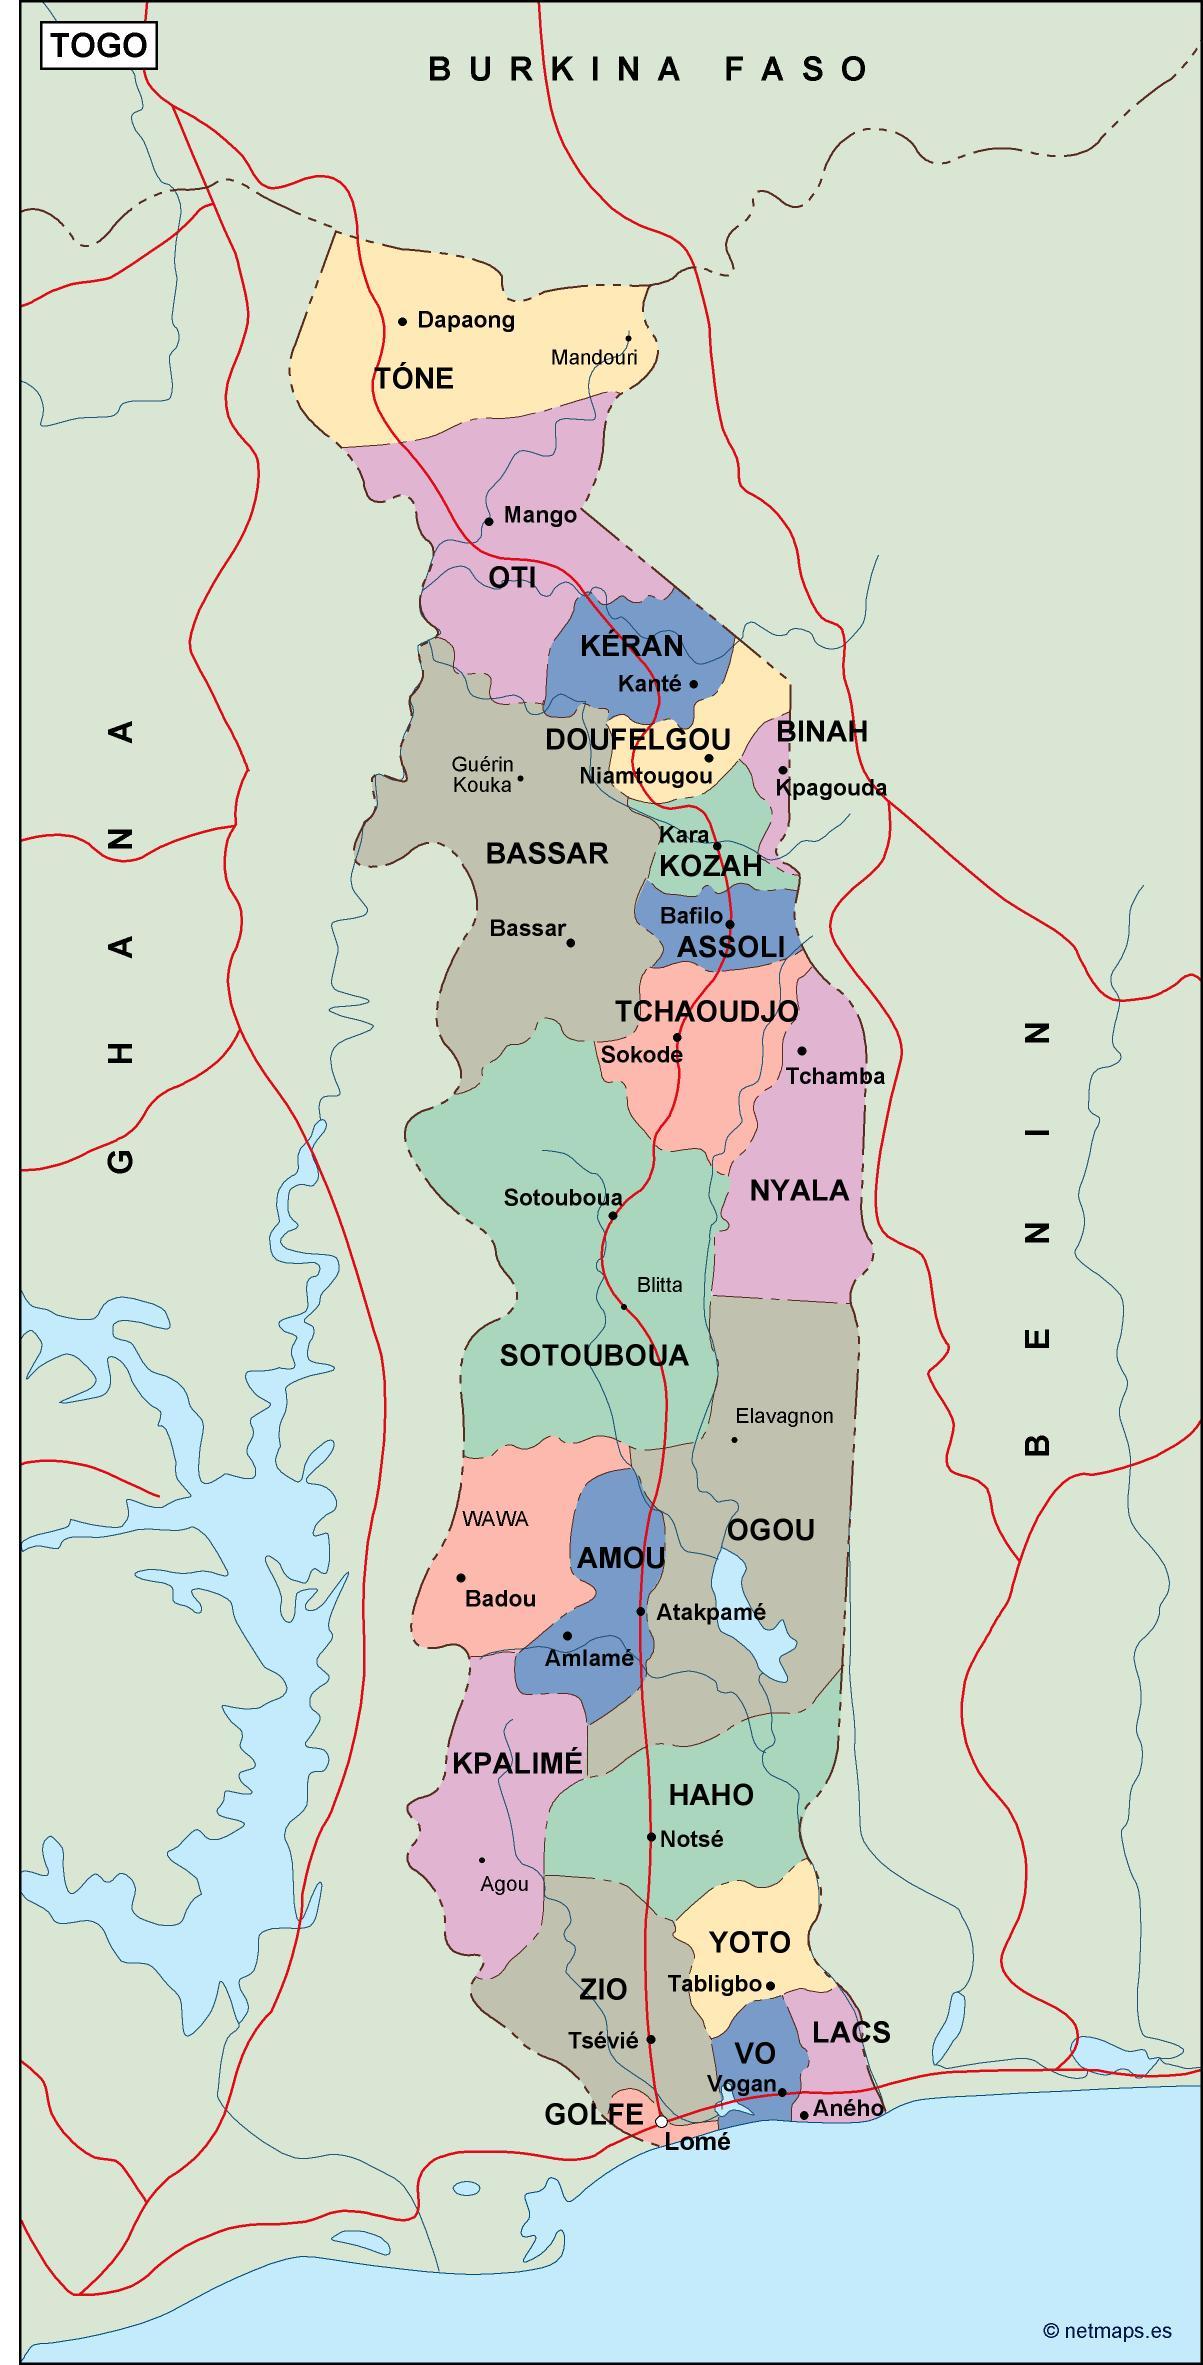 togo political map on rwanda map, africa map, ghana map, sierra leone map, angola map, malawi map, libya map, switzerland map, benin map, kenya map, sudan map, tunisia map, sweden map, tonga map, uganda map, morocco map, egypt map, zimbabwe map, madagascar map, algeria map, usa map, burkina faso map, chad map, comoros map, mali map, nigeria map, niger map, senegal map, guadeloupe map, congo map, namibia map, mozambique map, bahrain map, ethiopia map,